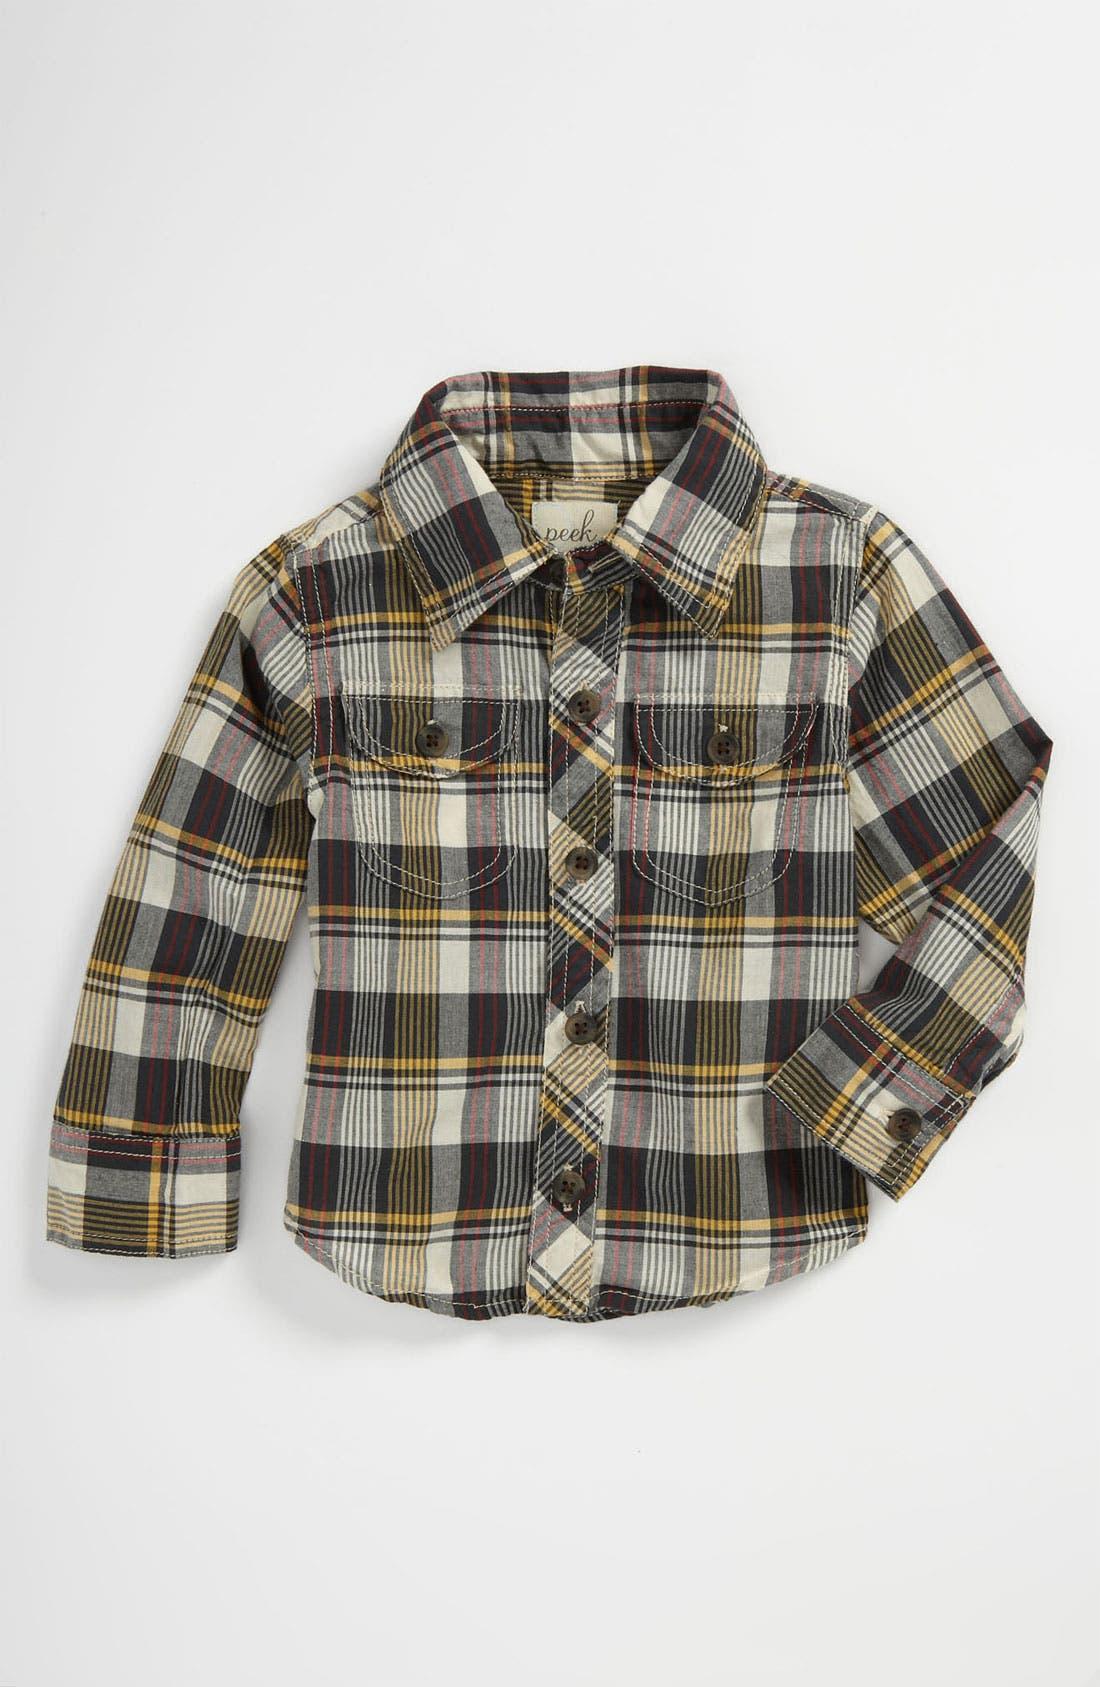 Main Image - Peek 'Camden' Plaid Shirt (Baby)